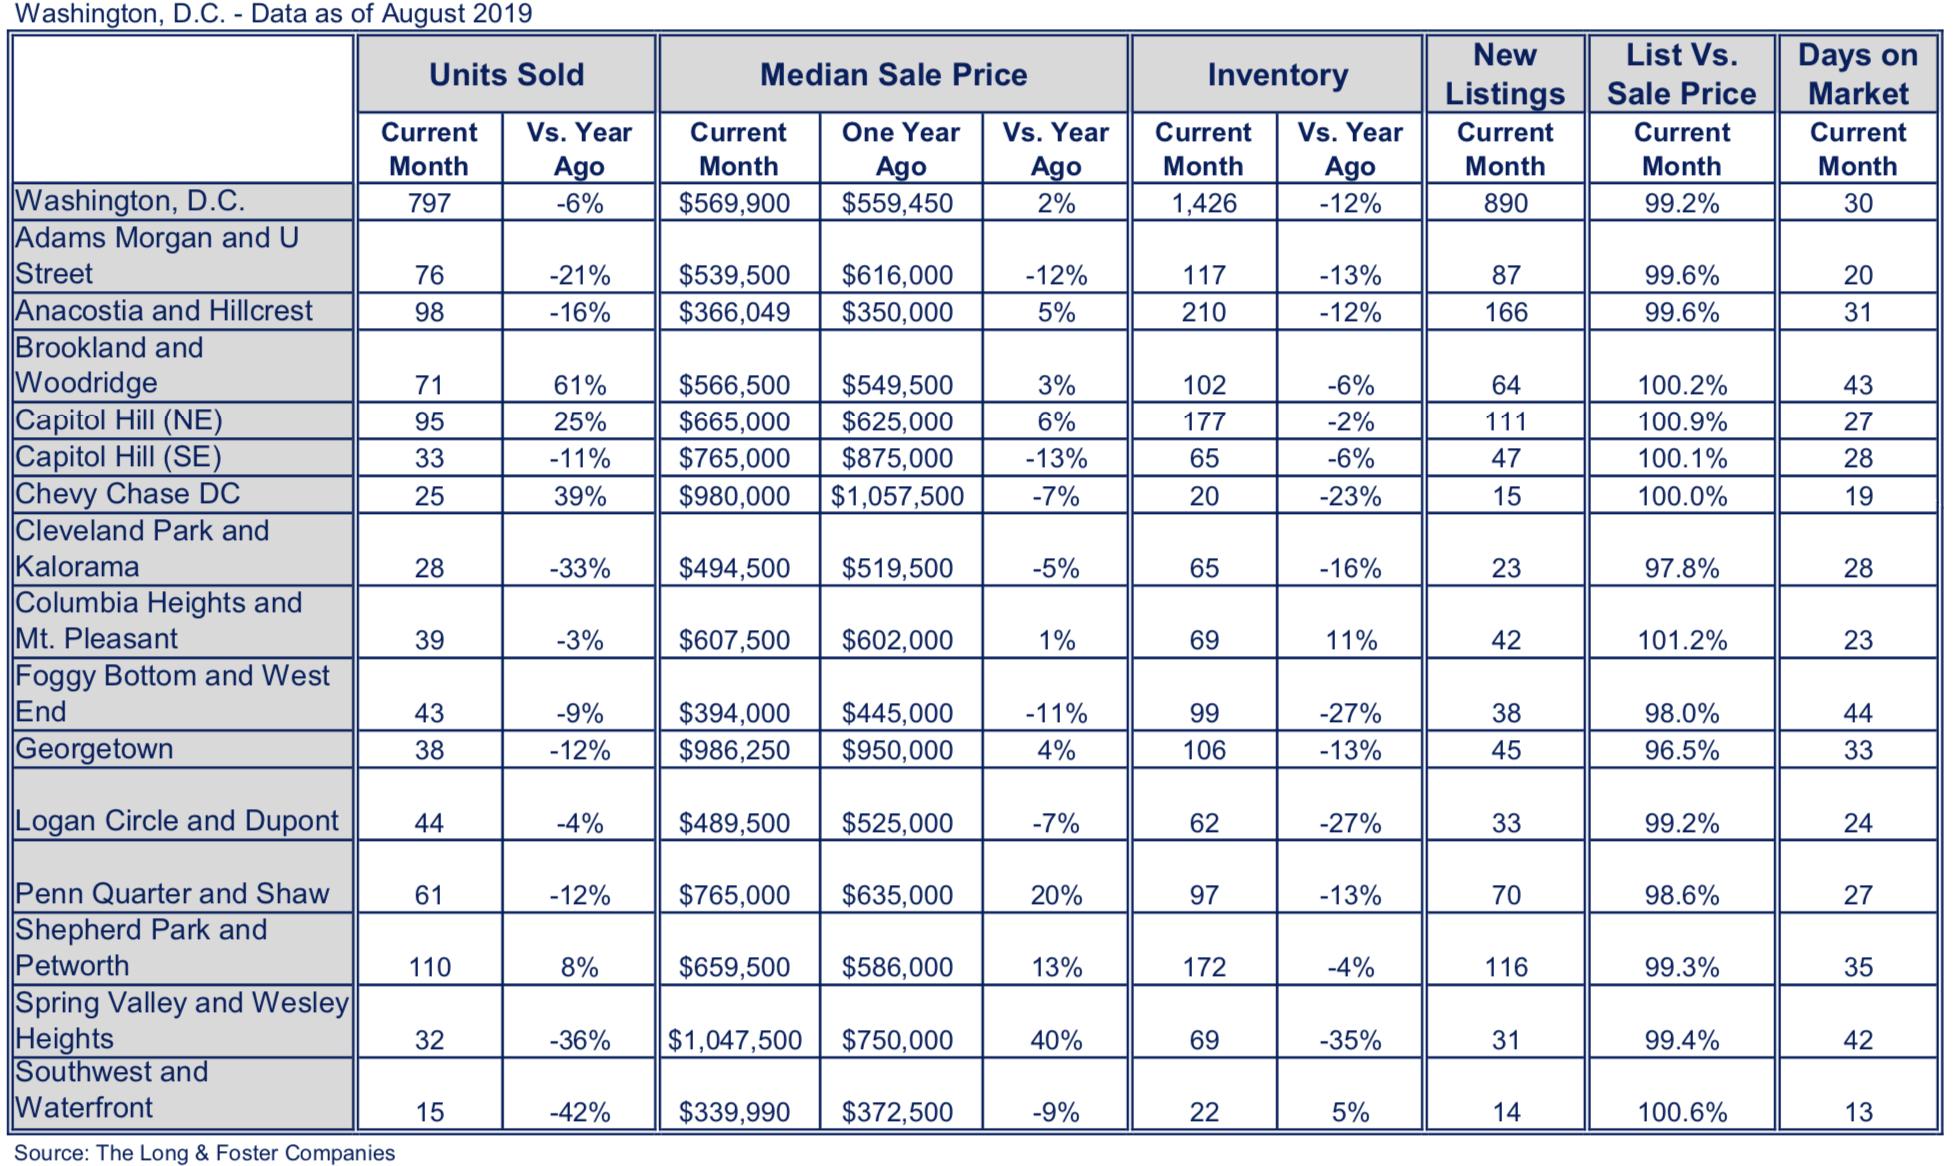 Washington, DC Market Minute Chart August 2019